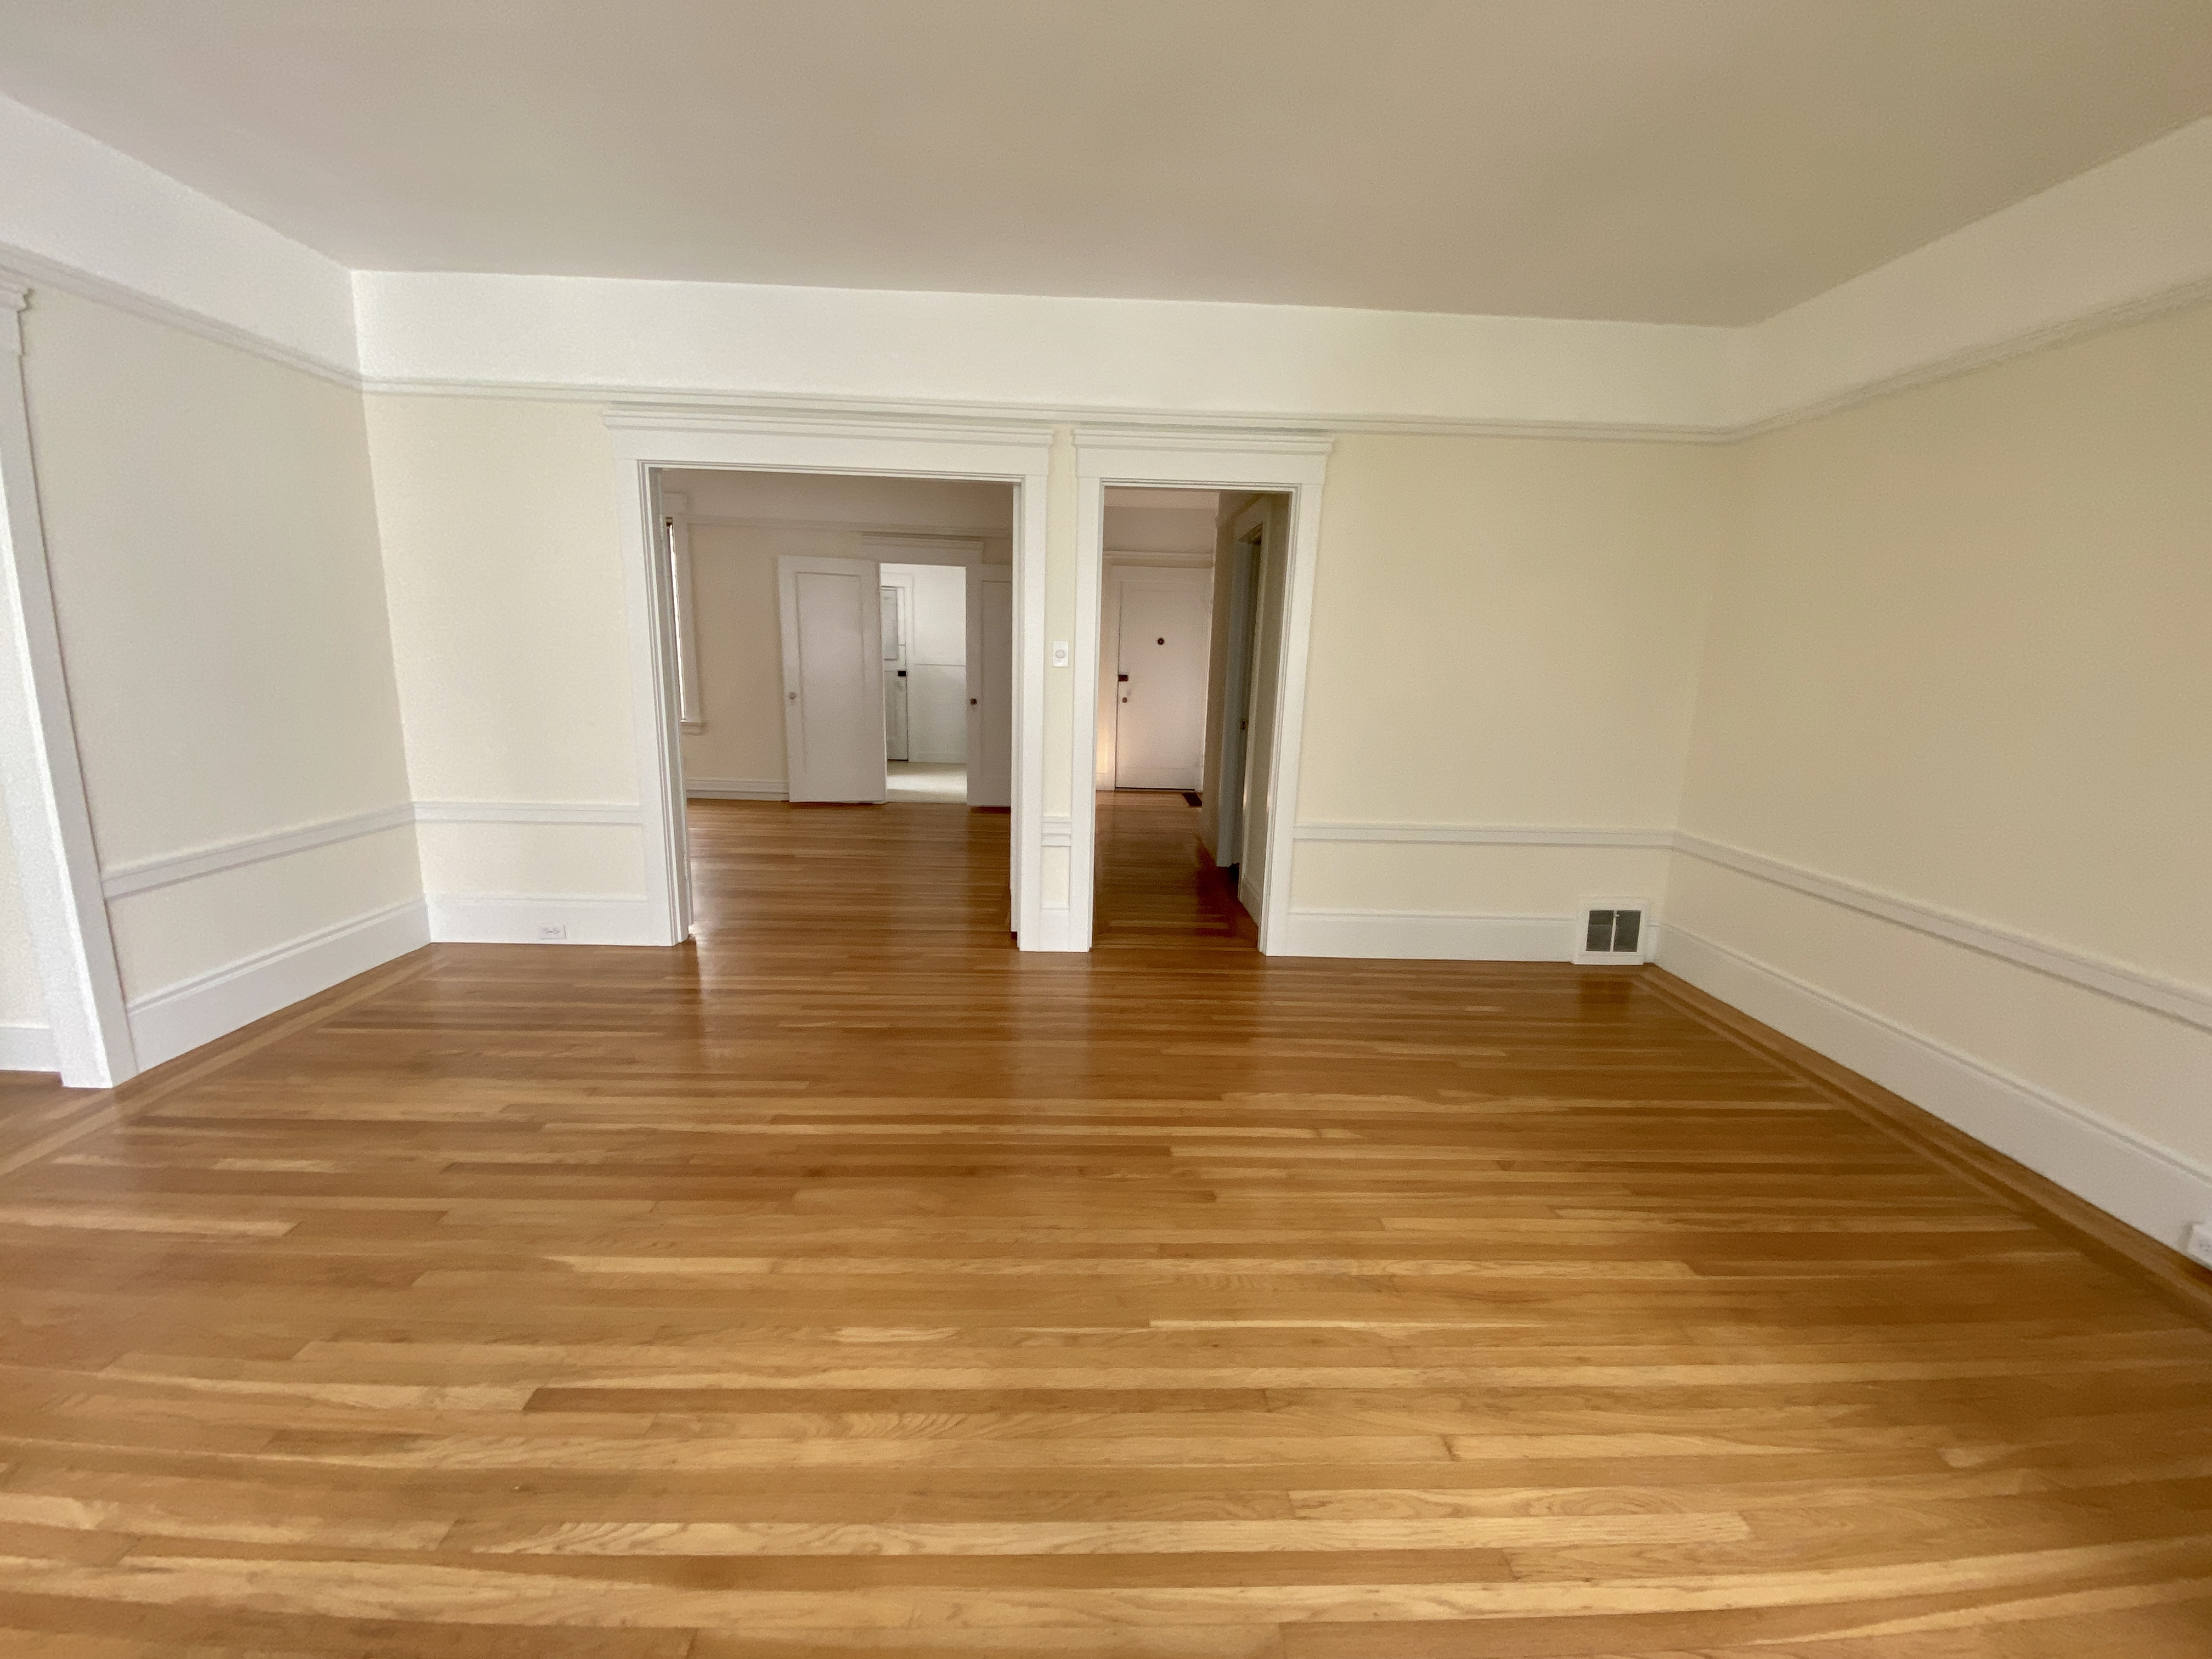 3156 Gough Street  # 2, San Francisco, CA, 94123 - 4